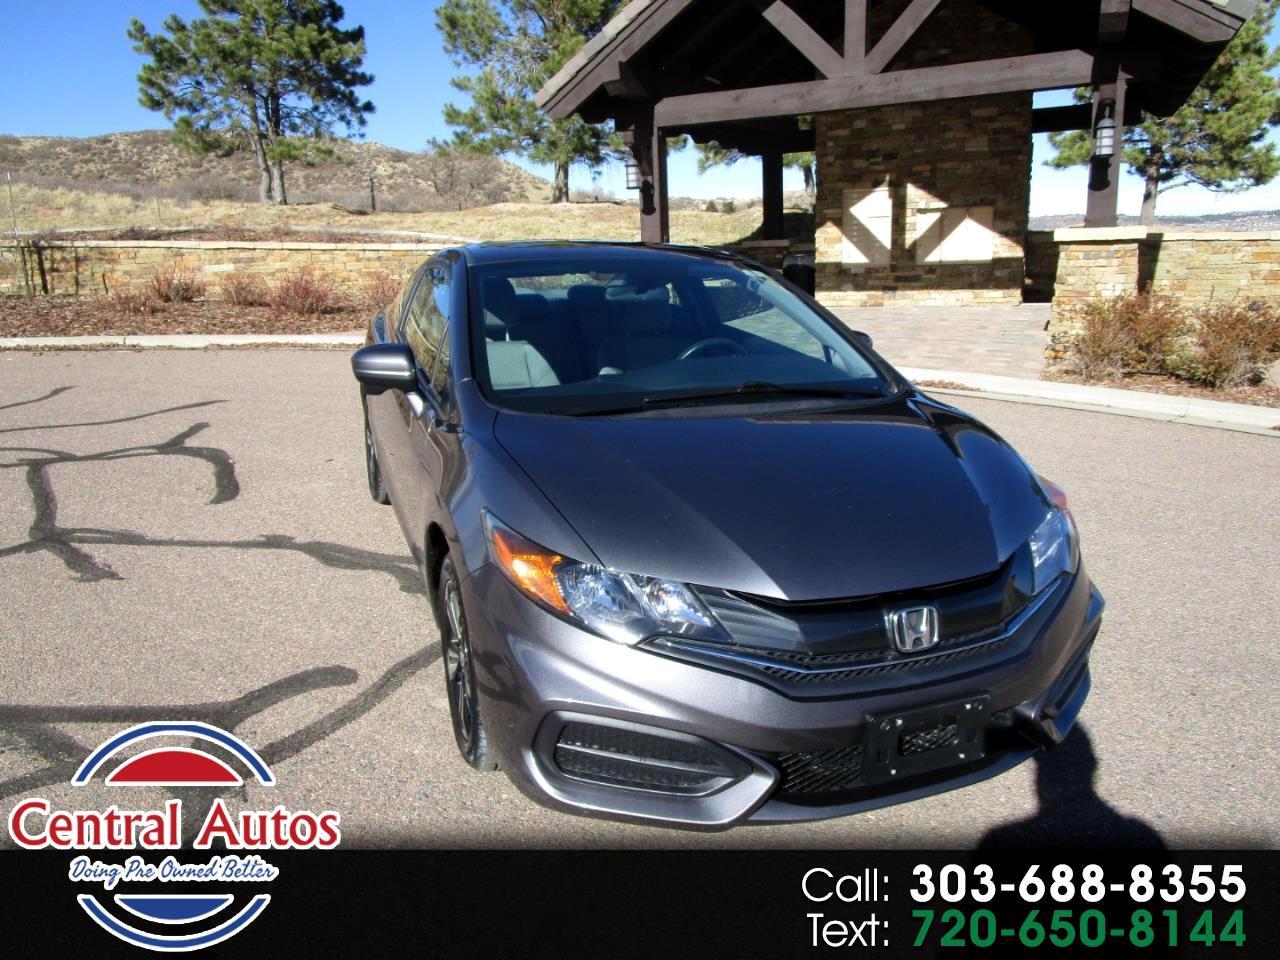 2015 Honda Civic Coupe 2dr CVT EX